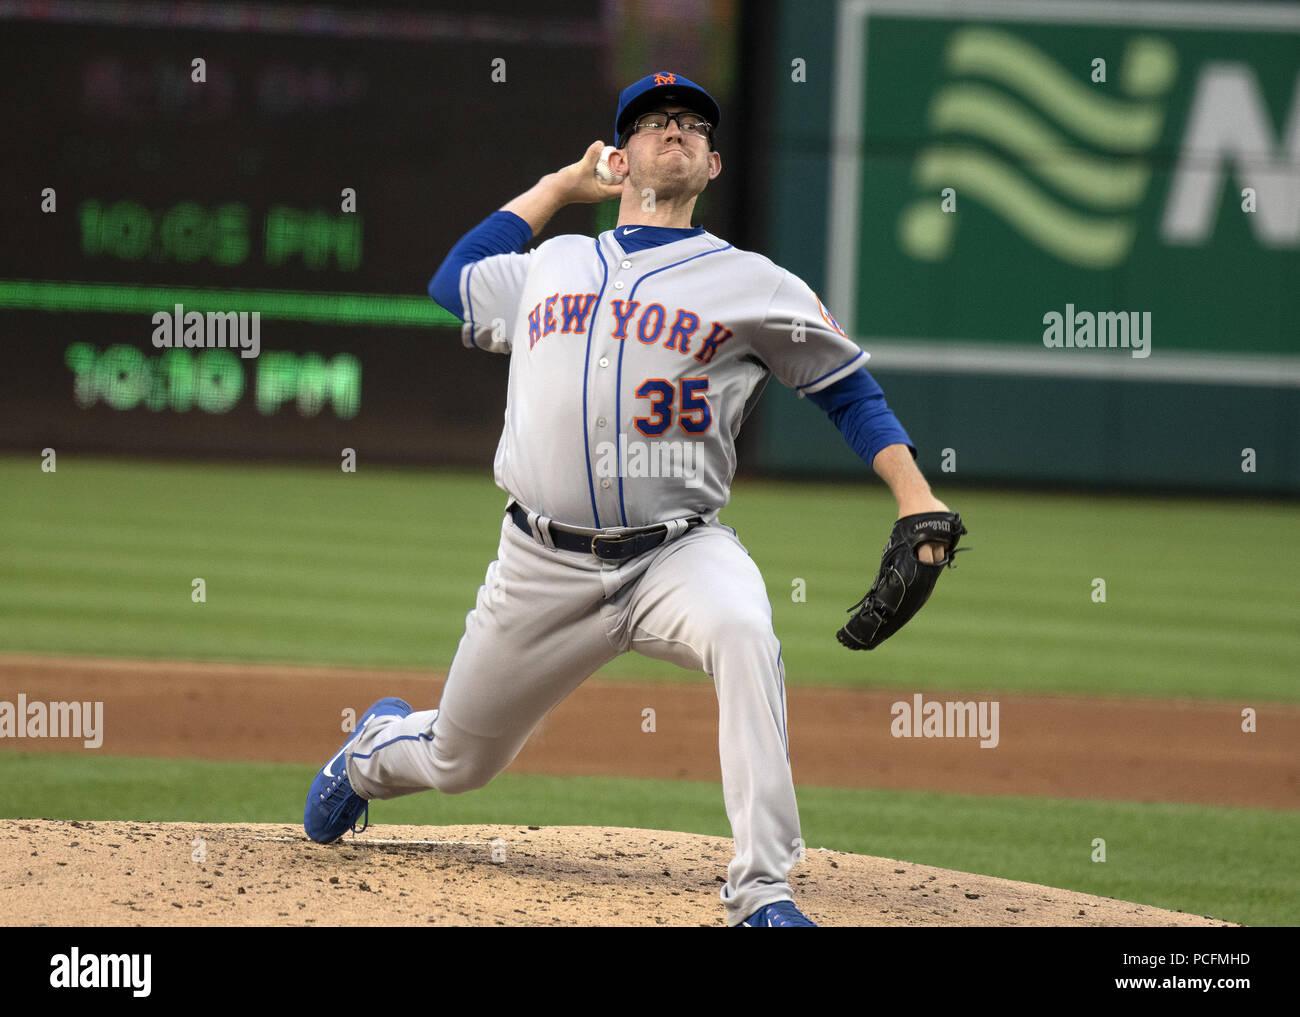 32b3d80fe Washington, District of Columbia, USA. 31st July, 2018. New York Mets